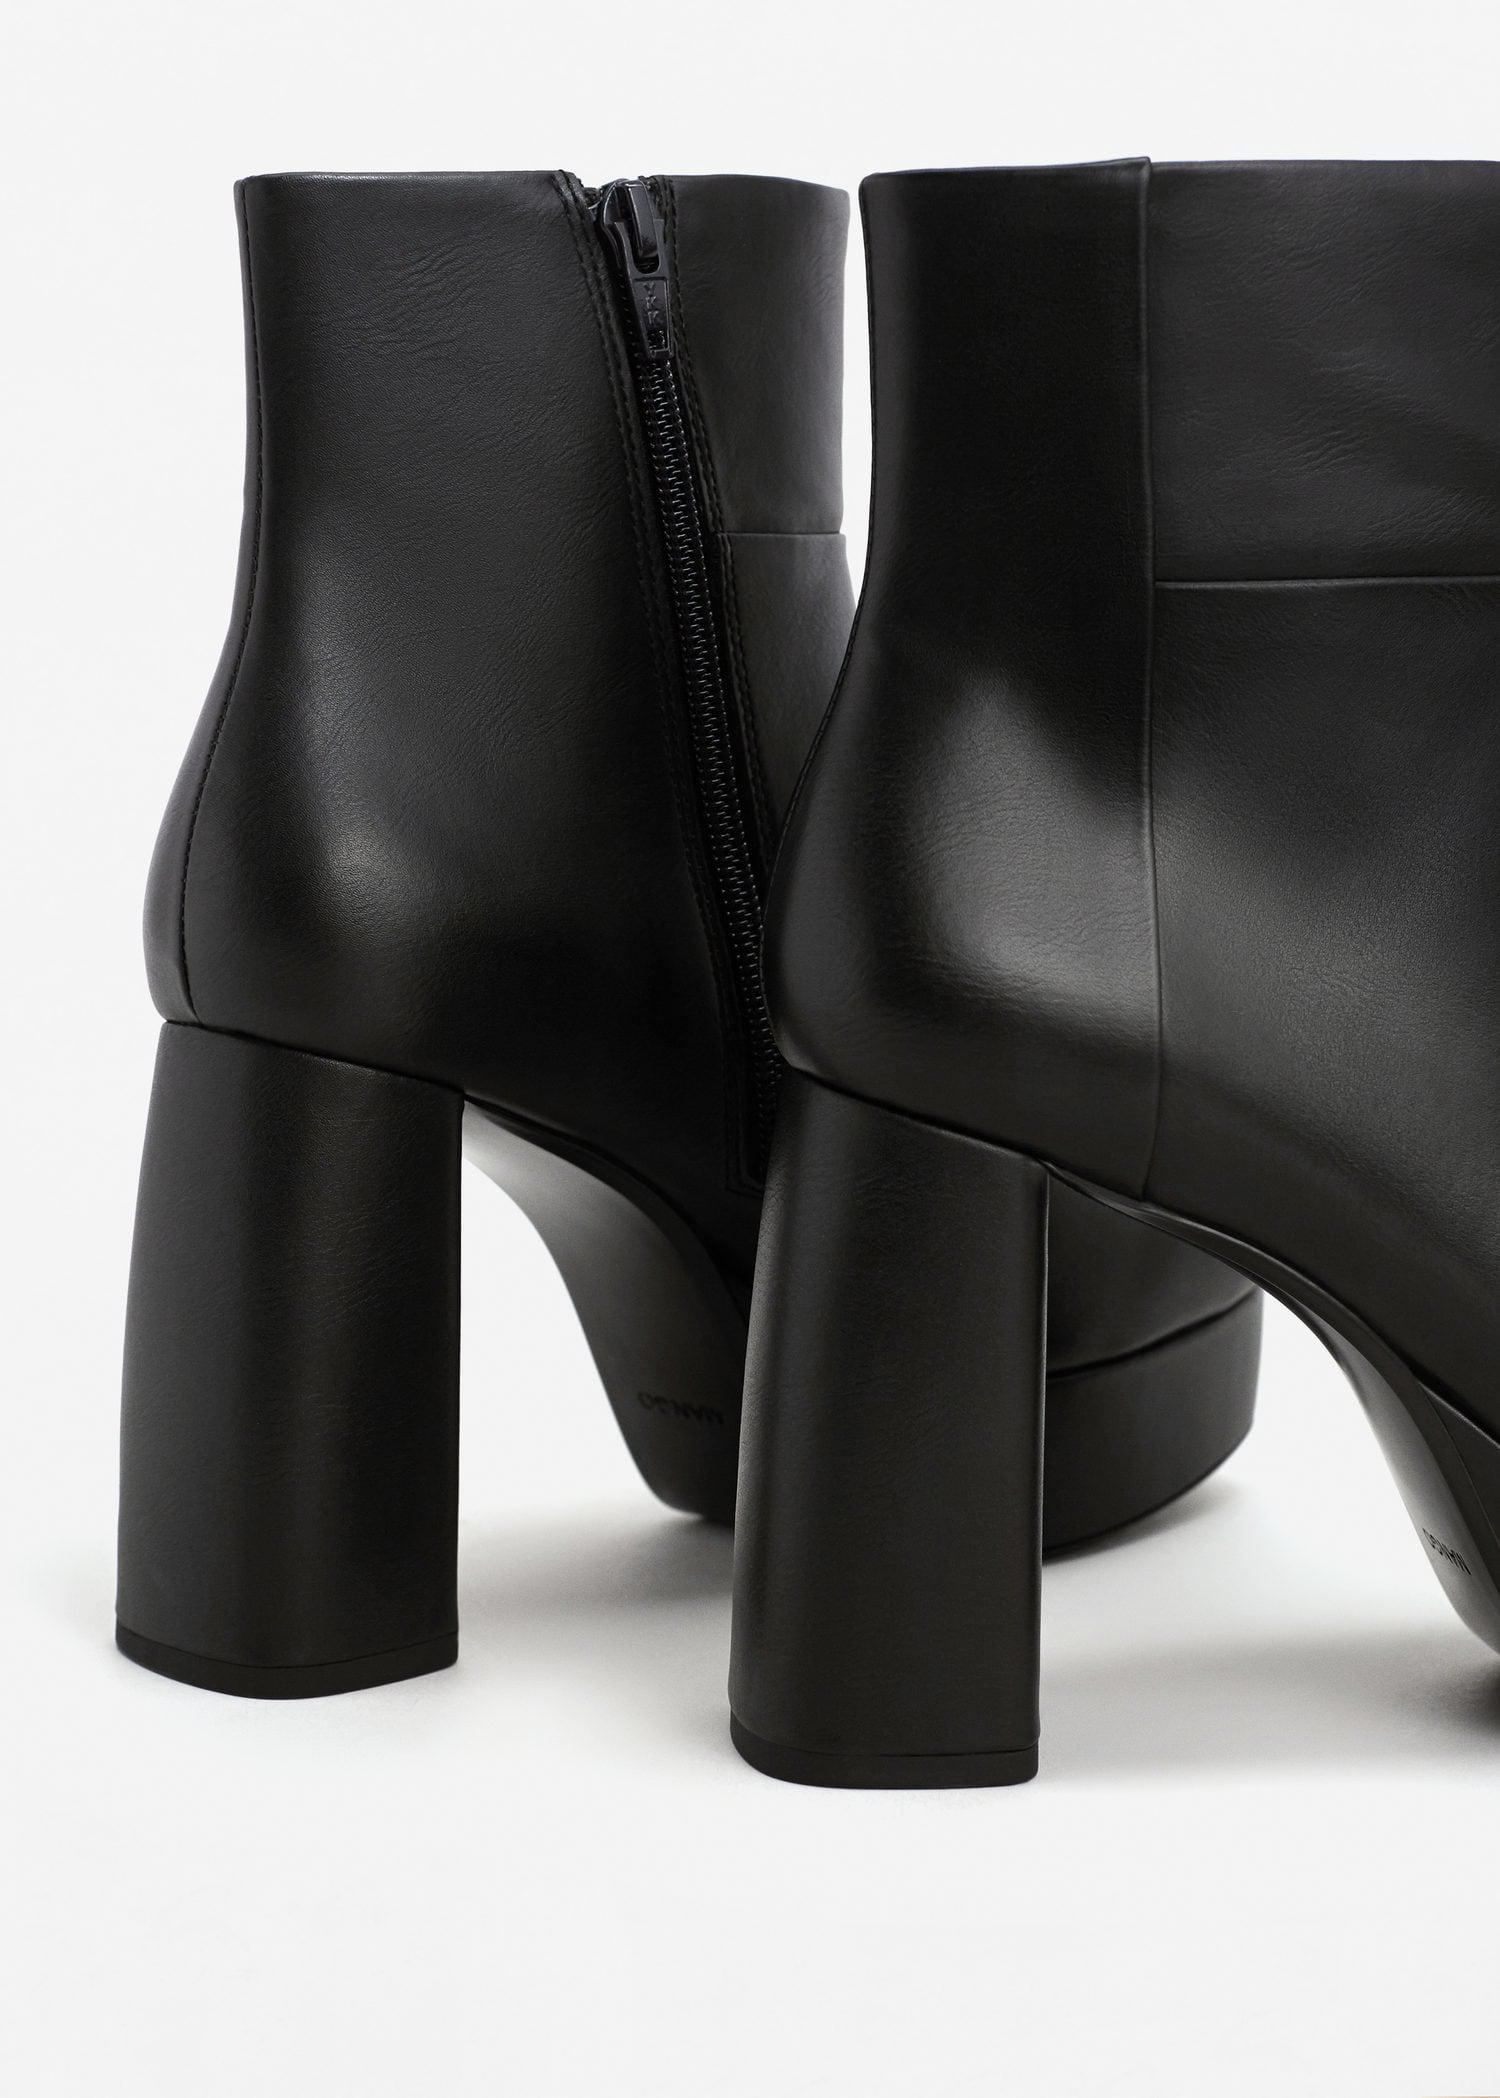 Mango Zipped Platform Boots in Black